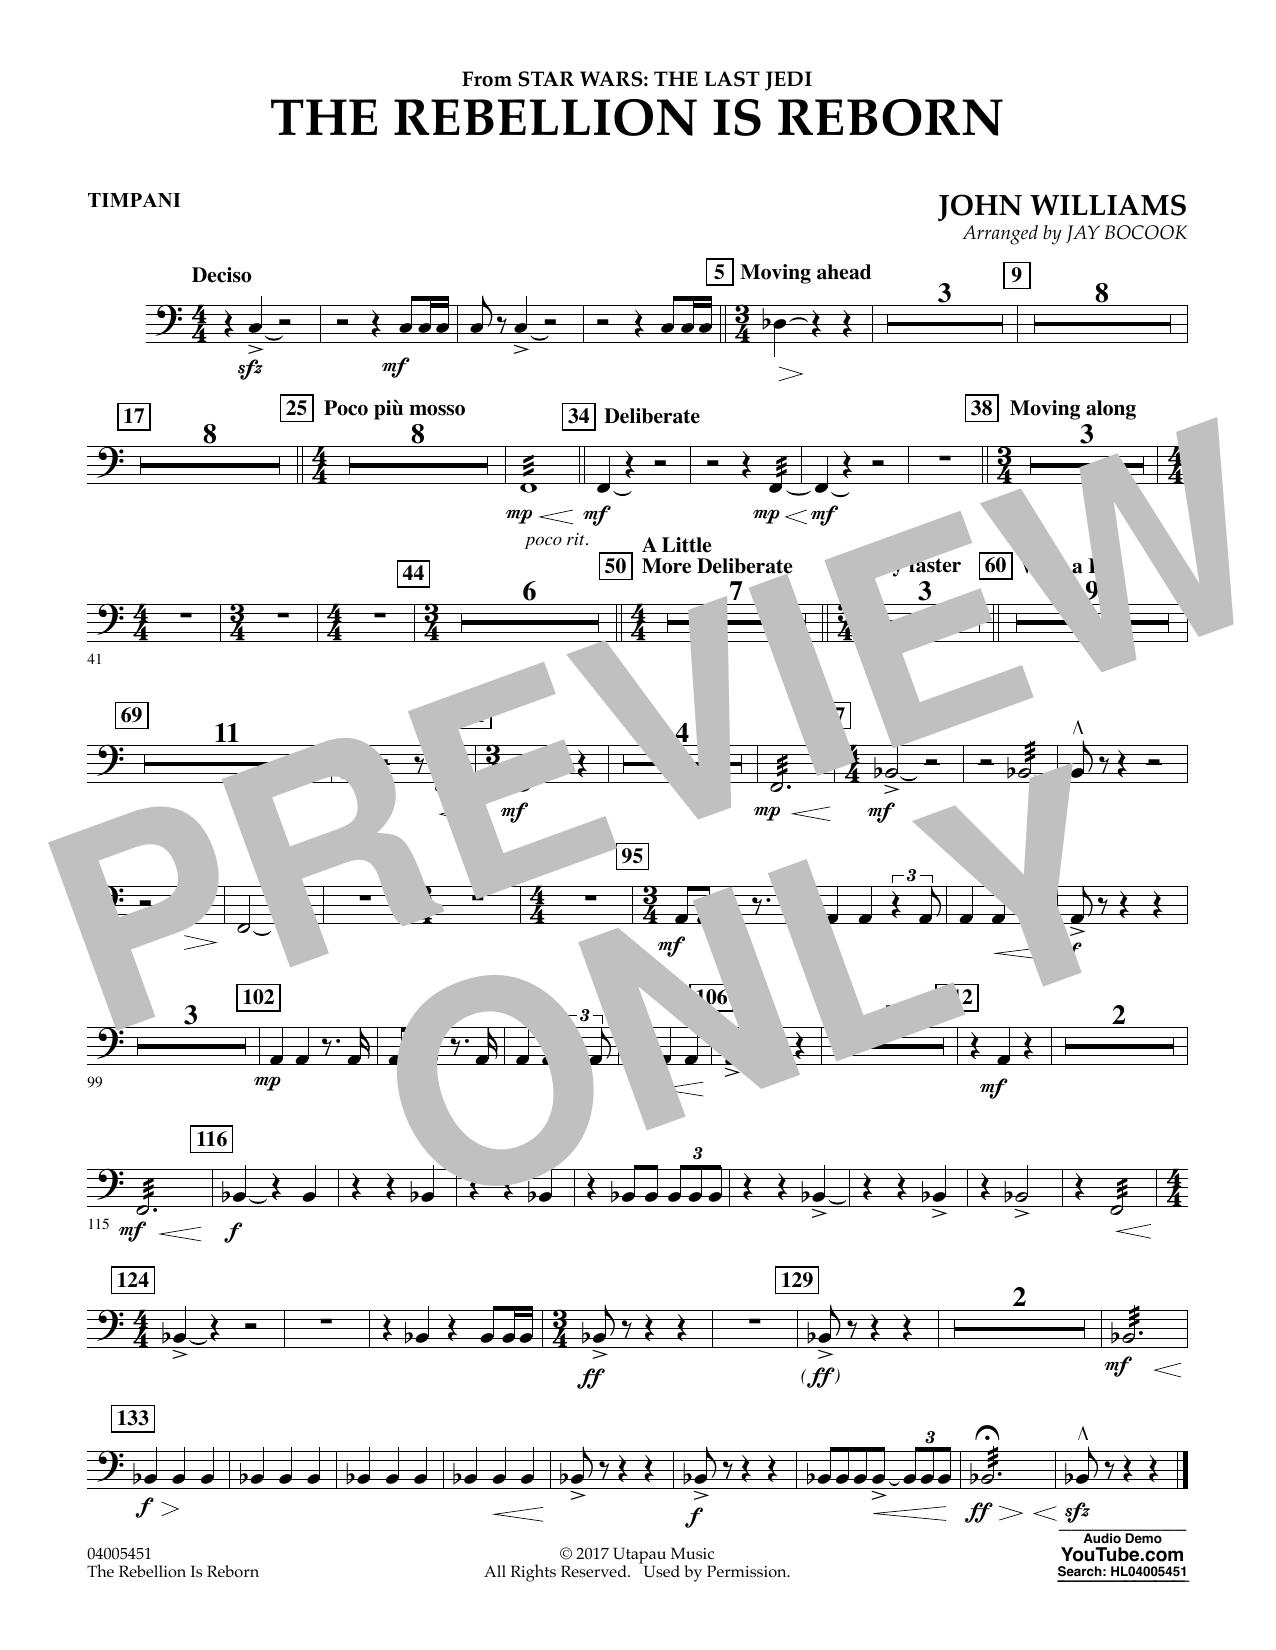 The Rebellion Is Reborn (from Star Wars: The Last Jedi) - Timpani (Concert Band)